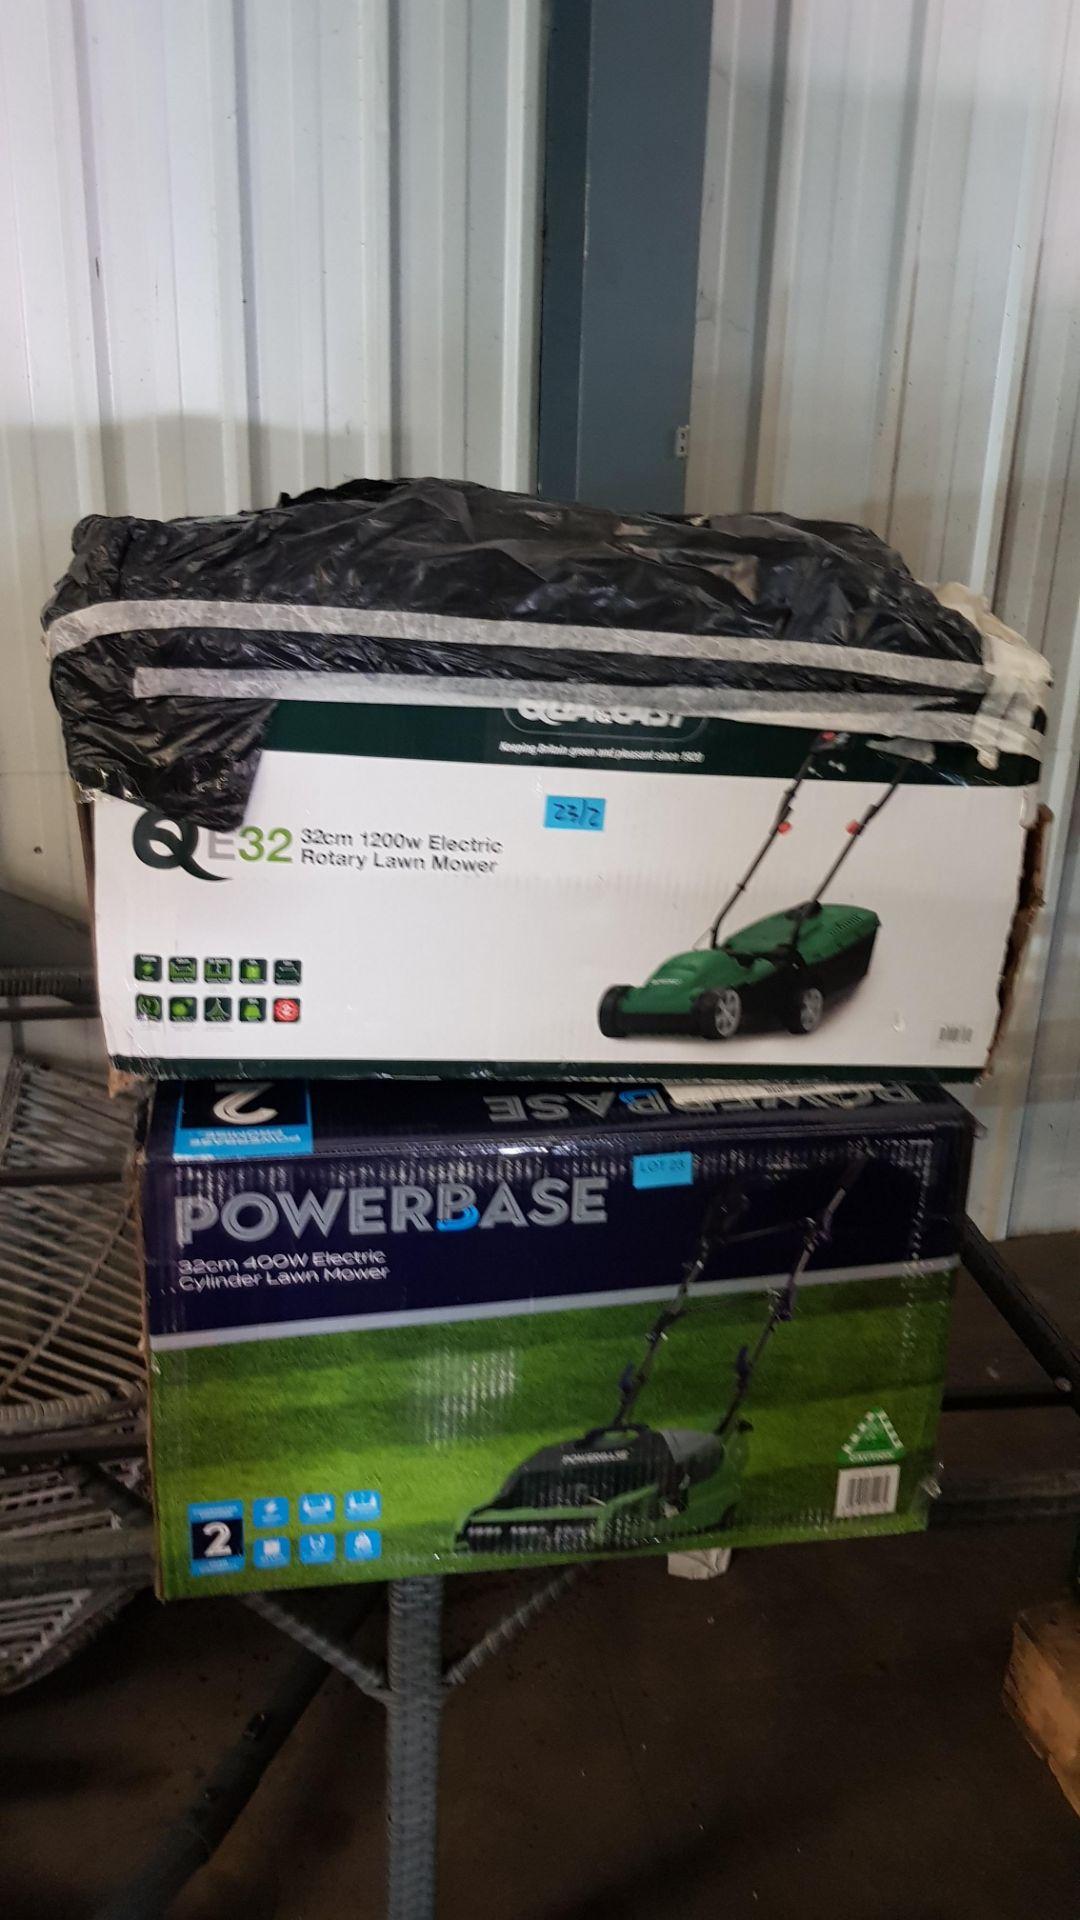 (P9) 2x Items. 1x Powerbase 32cm 400W Electric Cylinder Lawn Mower. RRP £89. 1x Qualcast 32cm 1200 - Image 3 of 3